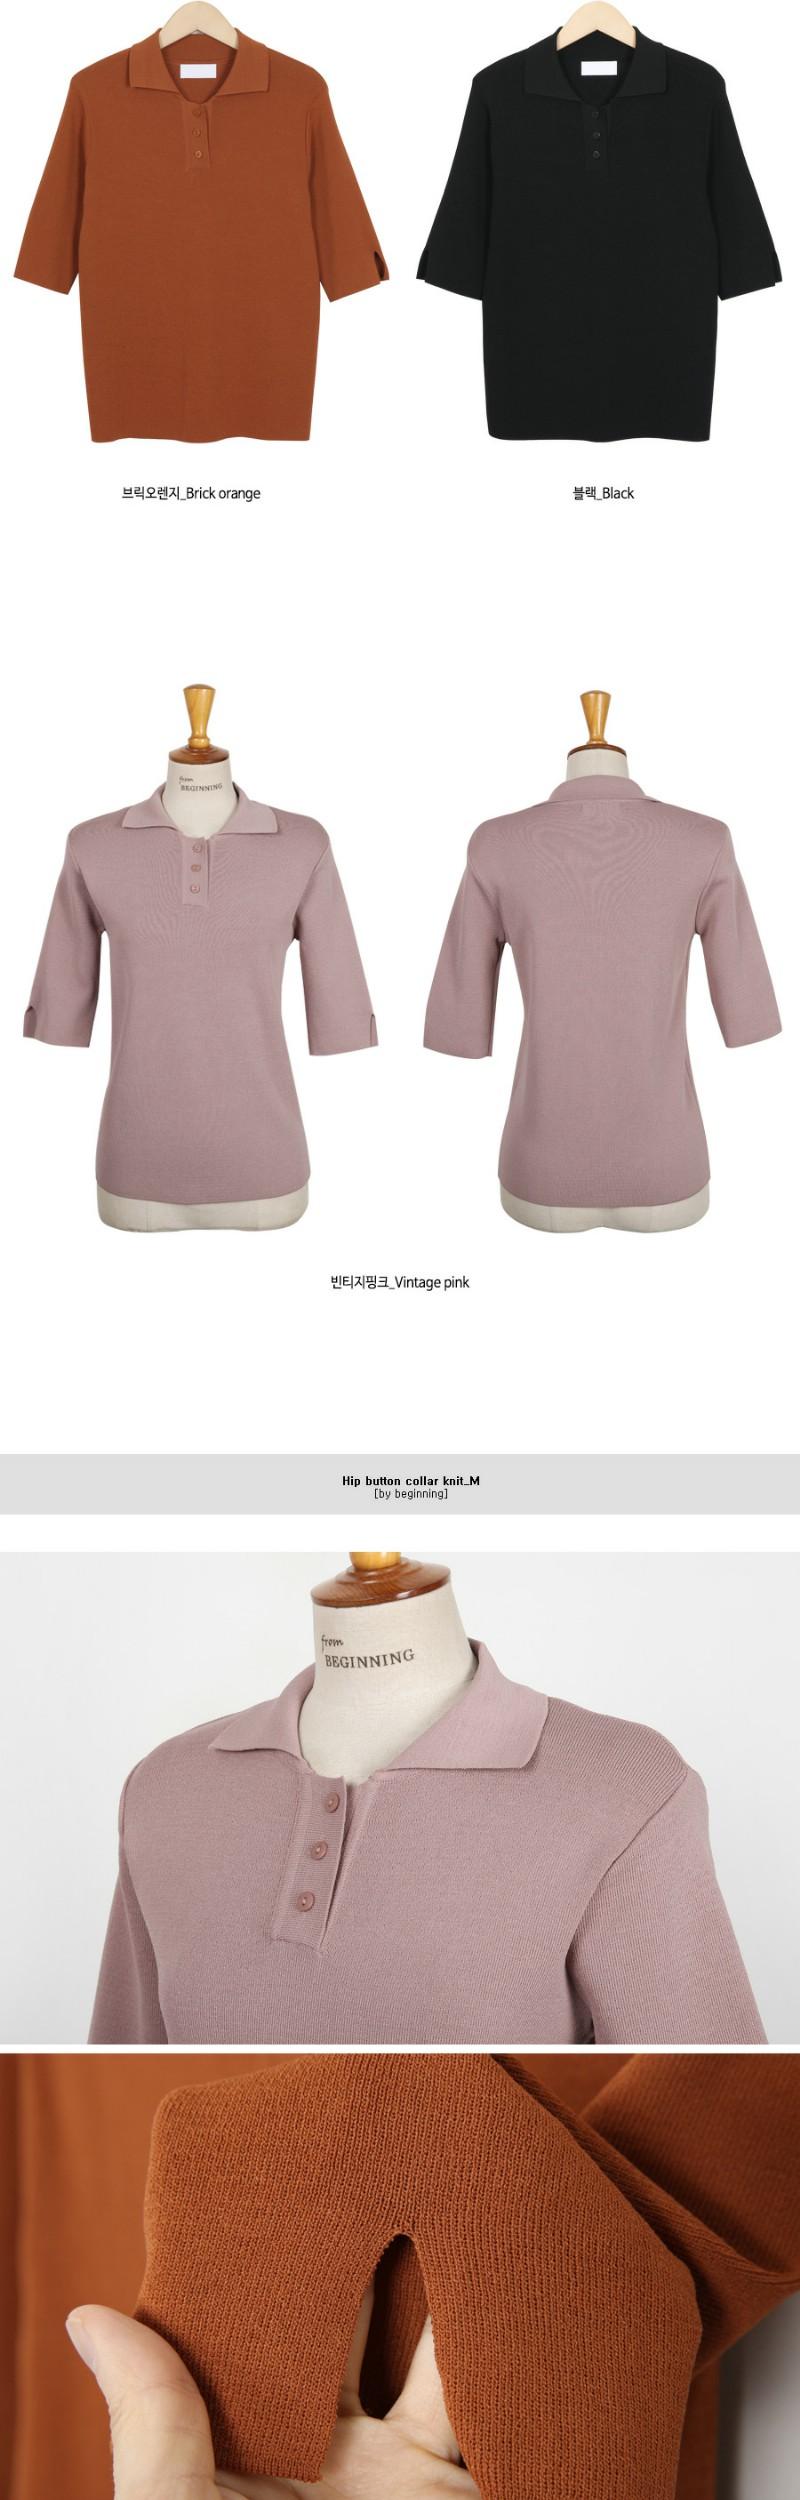 Hip button collar knit_M (size : free)